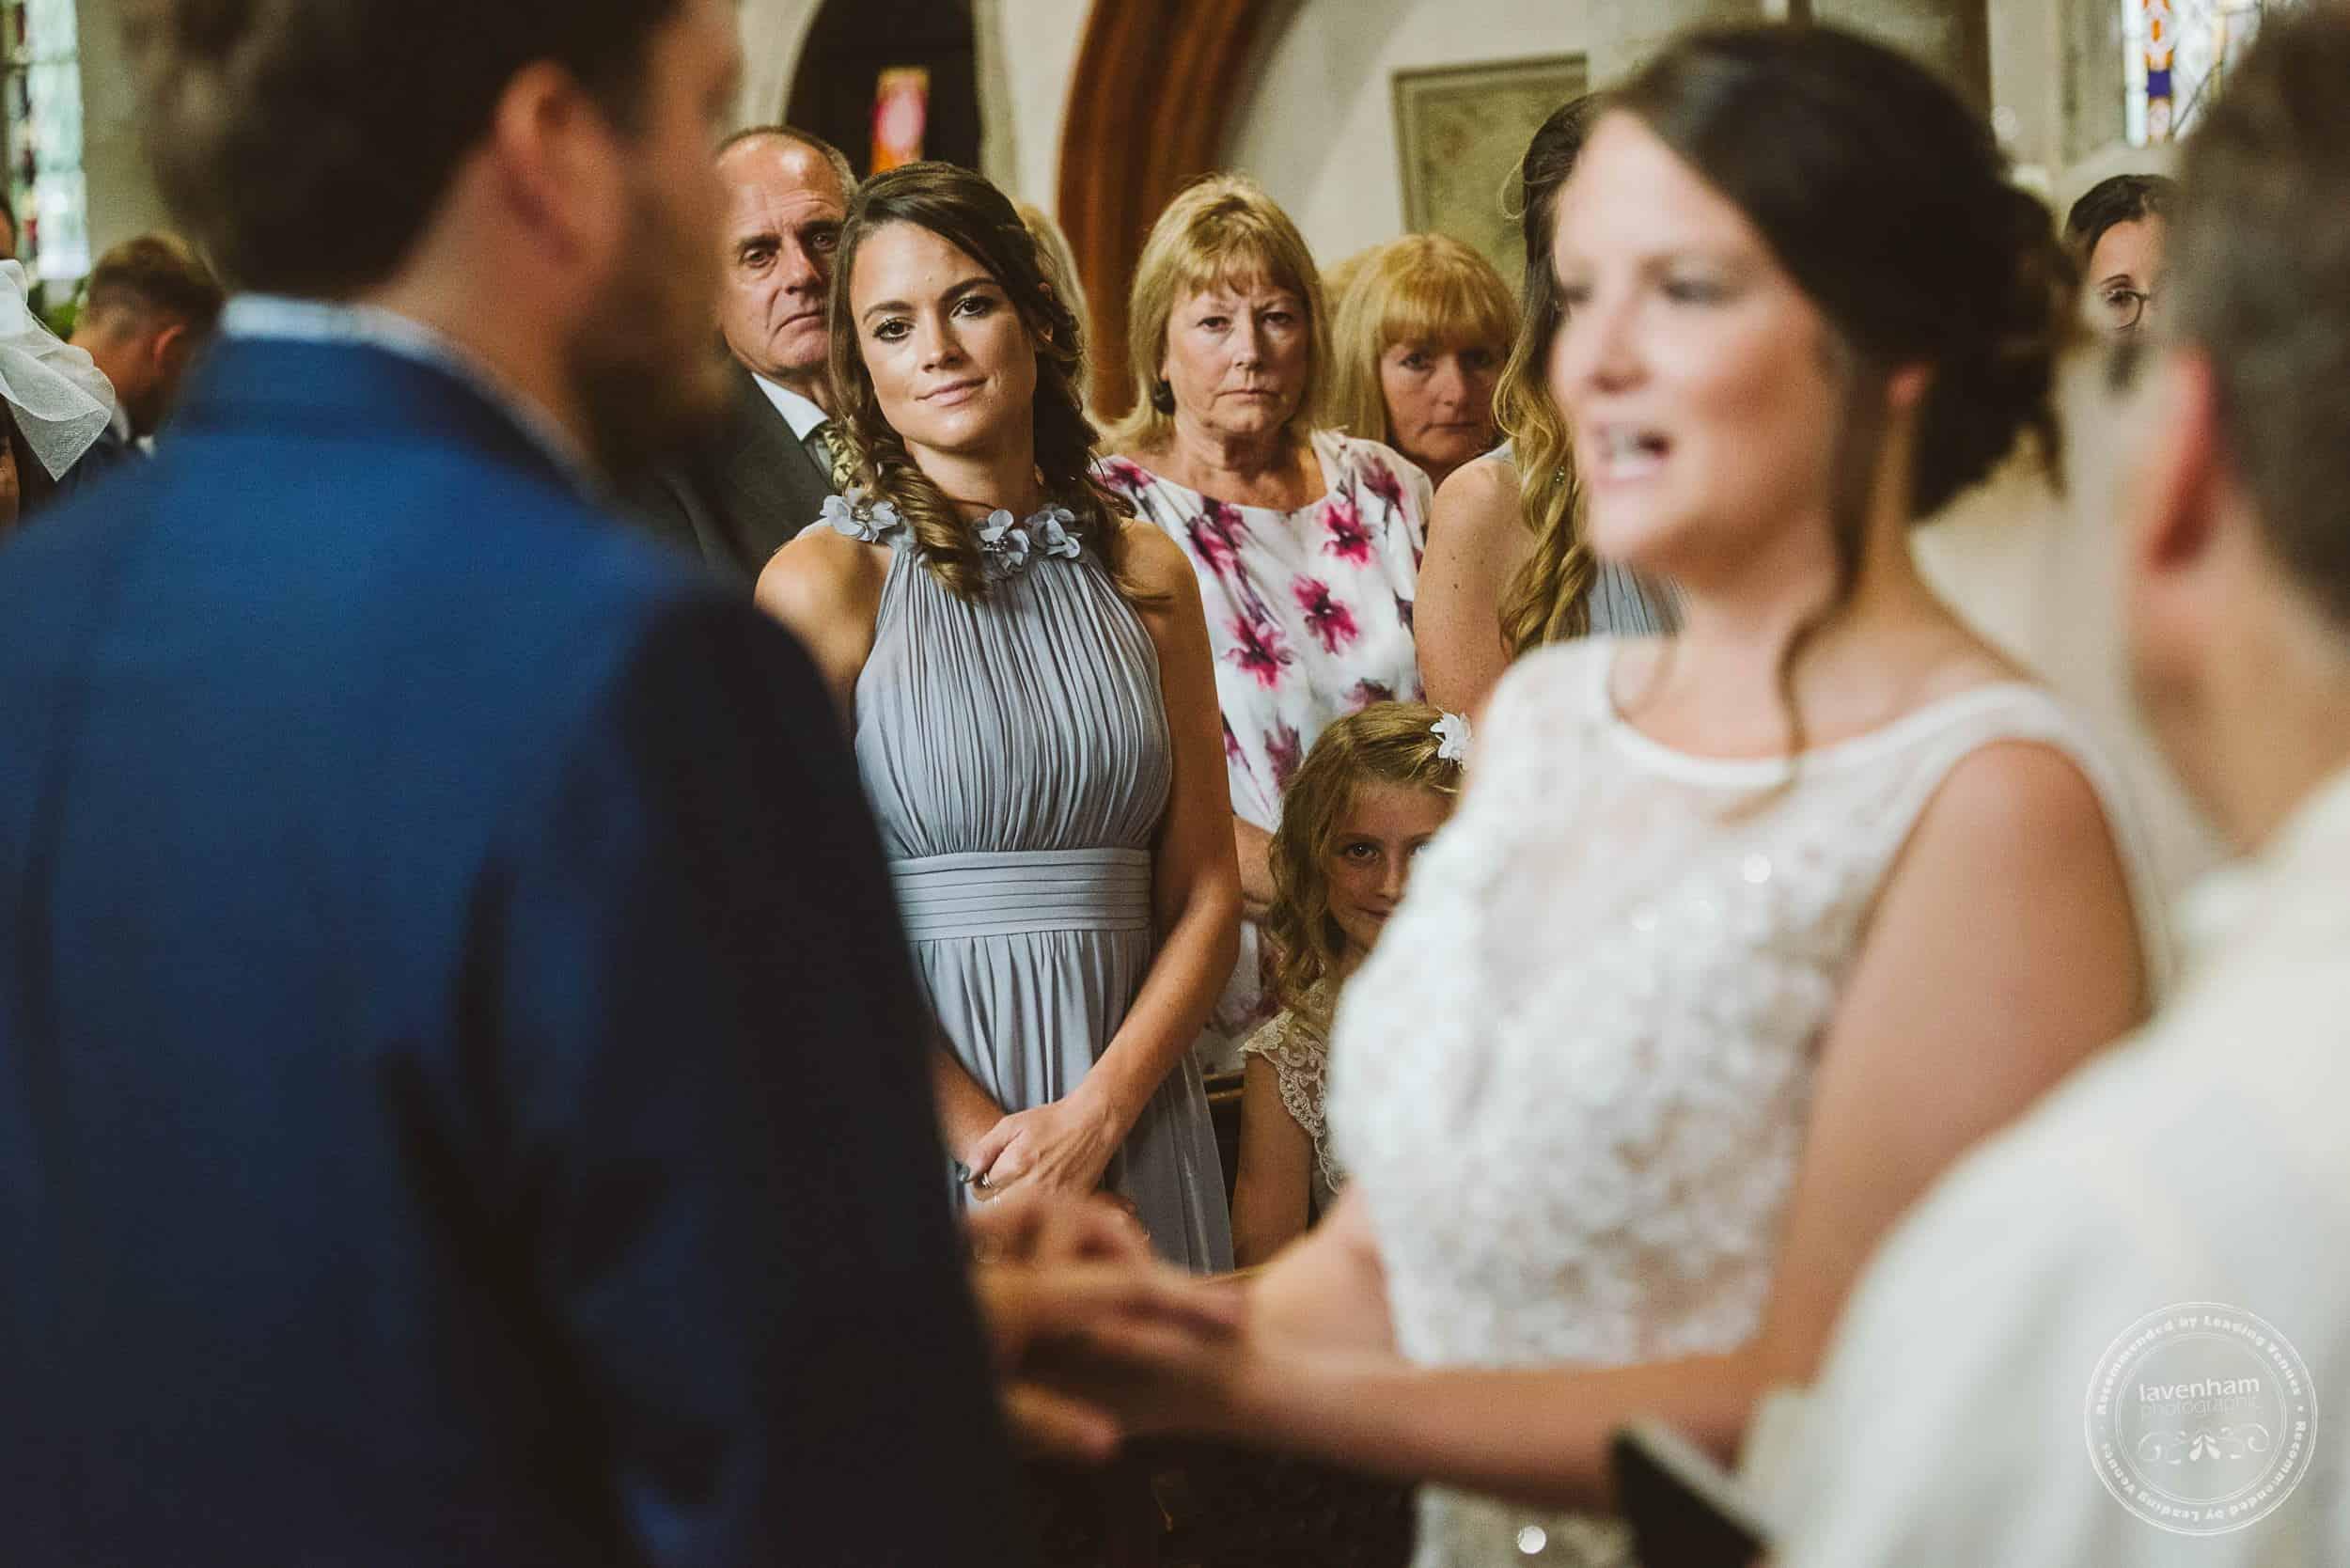 180818 Marks Hall Wedding Photography Lavenham Photographic 054